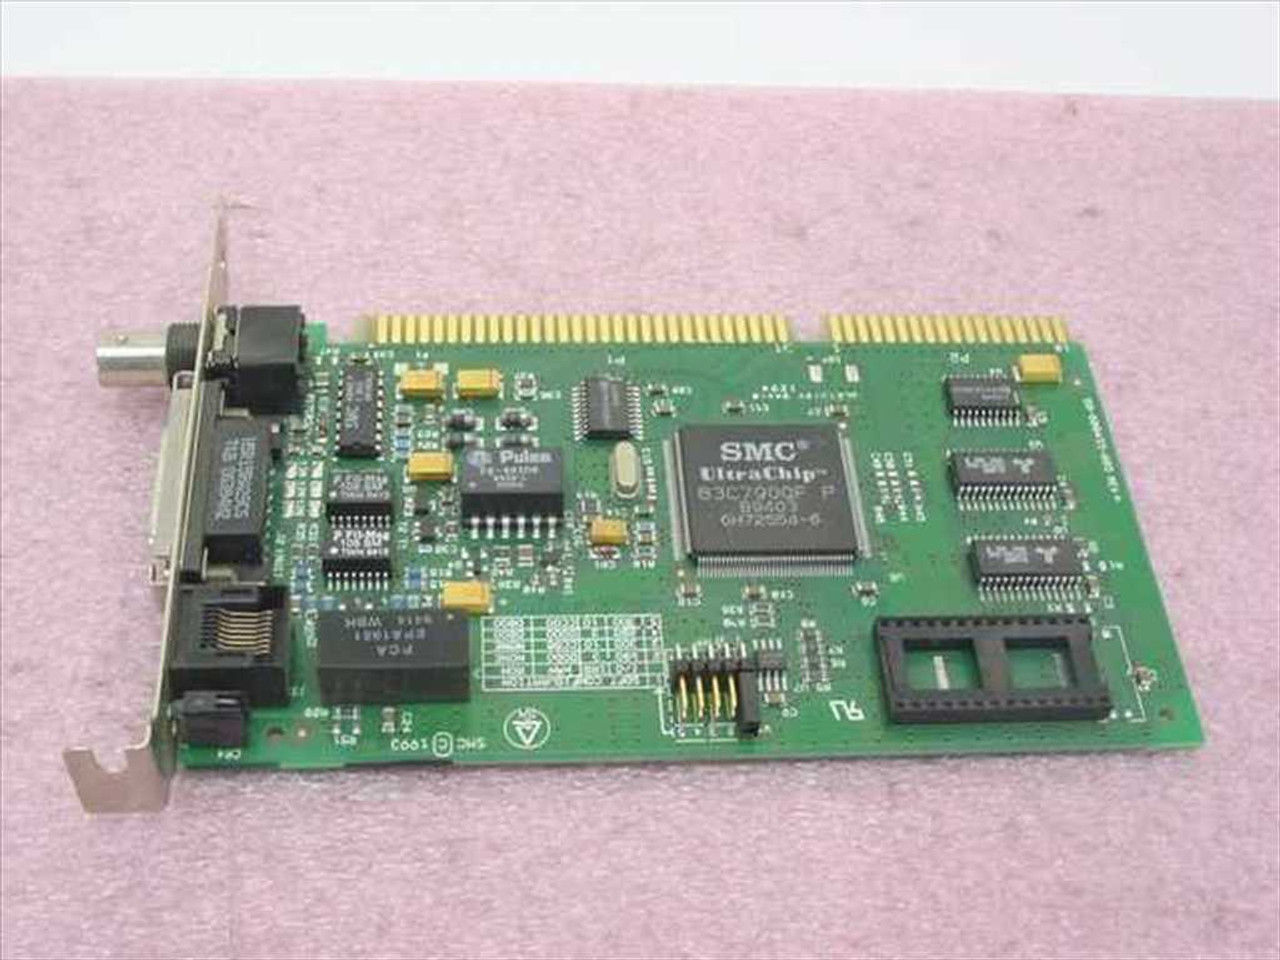 Smc 8216c ethernet isa rj45 aui bnc network card